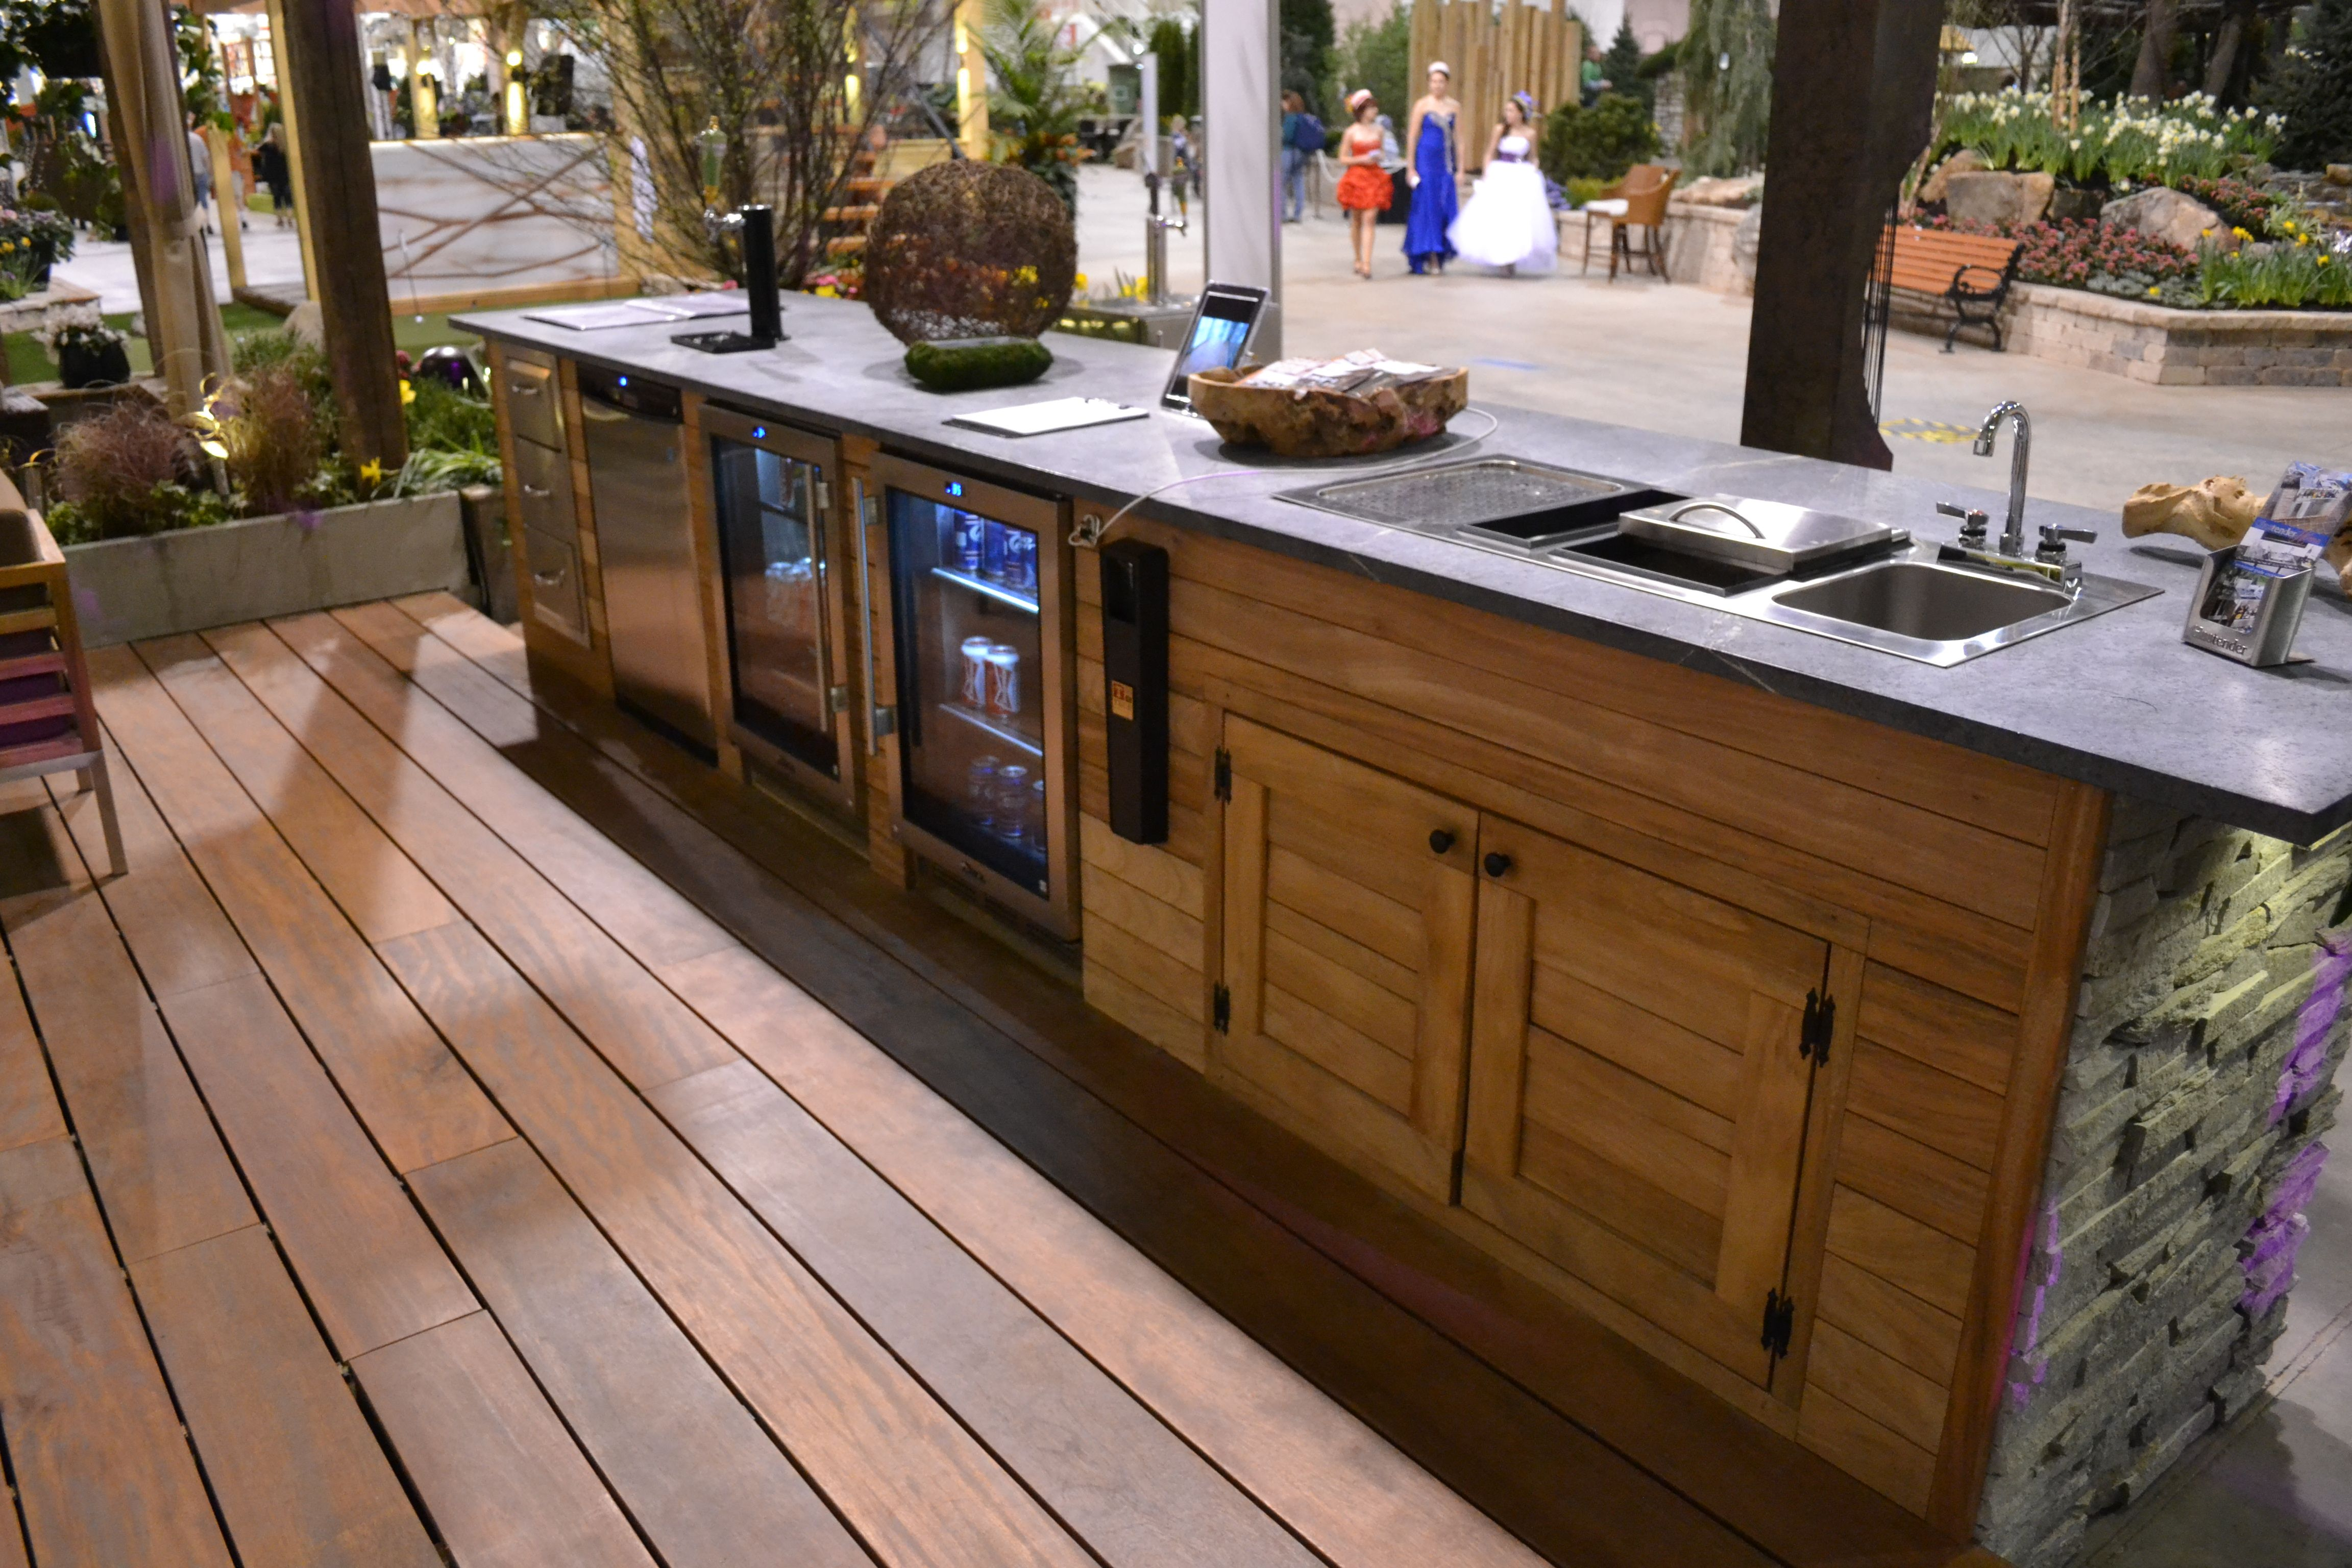 Kitchen Island Kegerator chicago - outdoor kitchen: glastender sink with condiment tray and